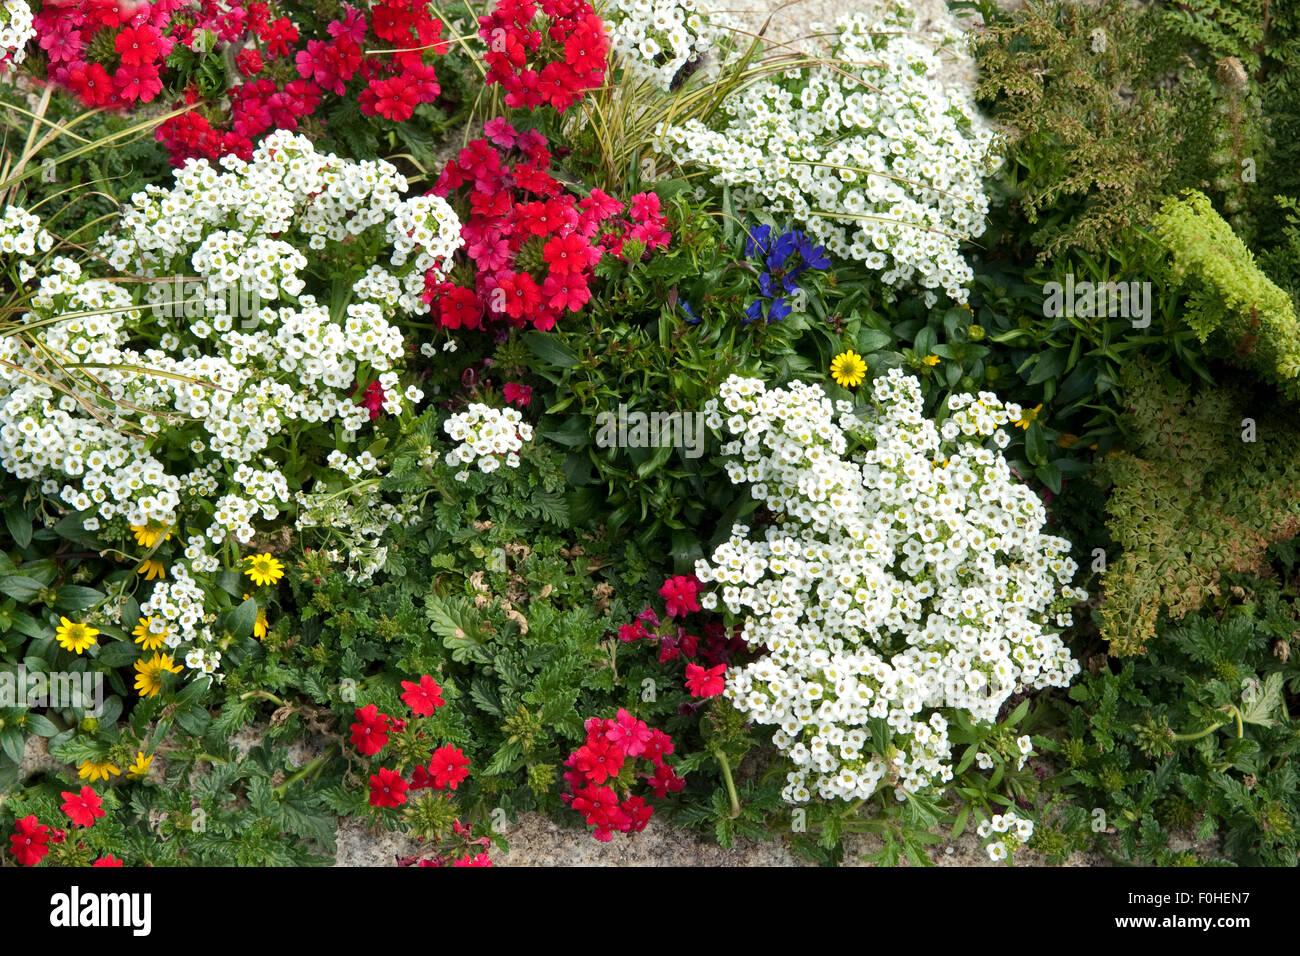 grabbepflanzung sommerblumen stockfoto bild 86436595 alamy. Black Bedroom Furniture Sets. Home Design Ideas